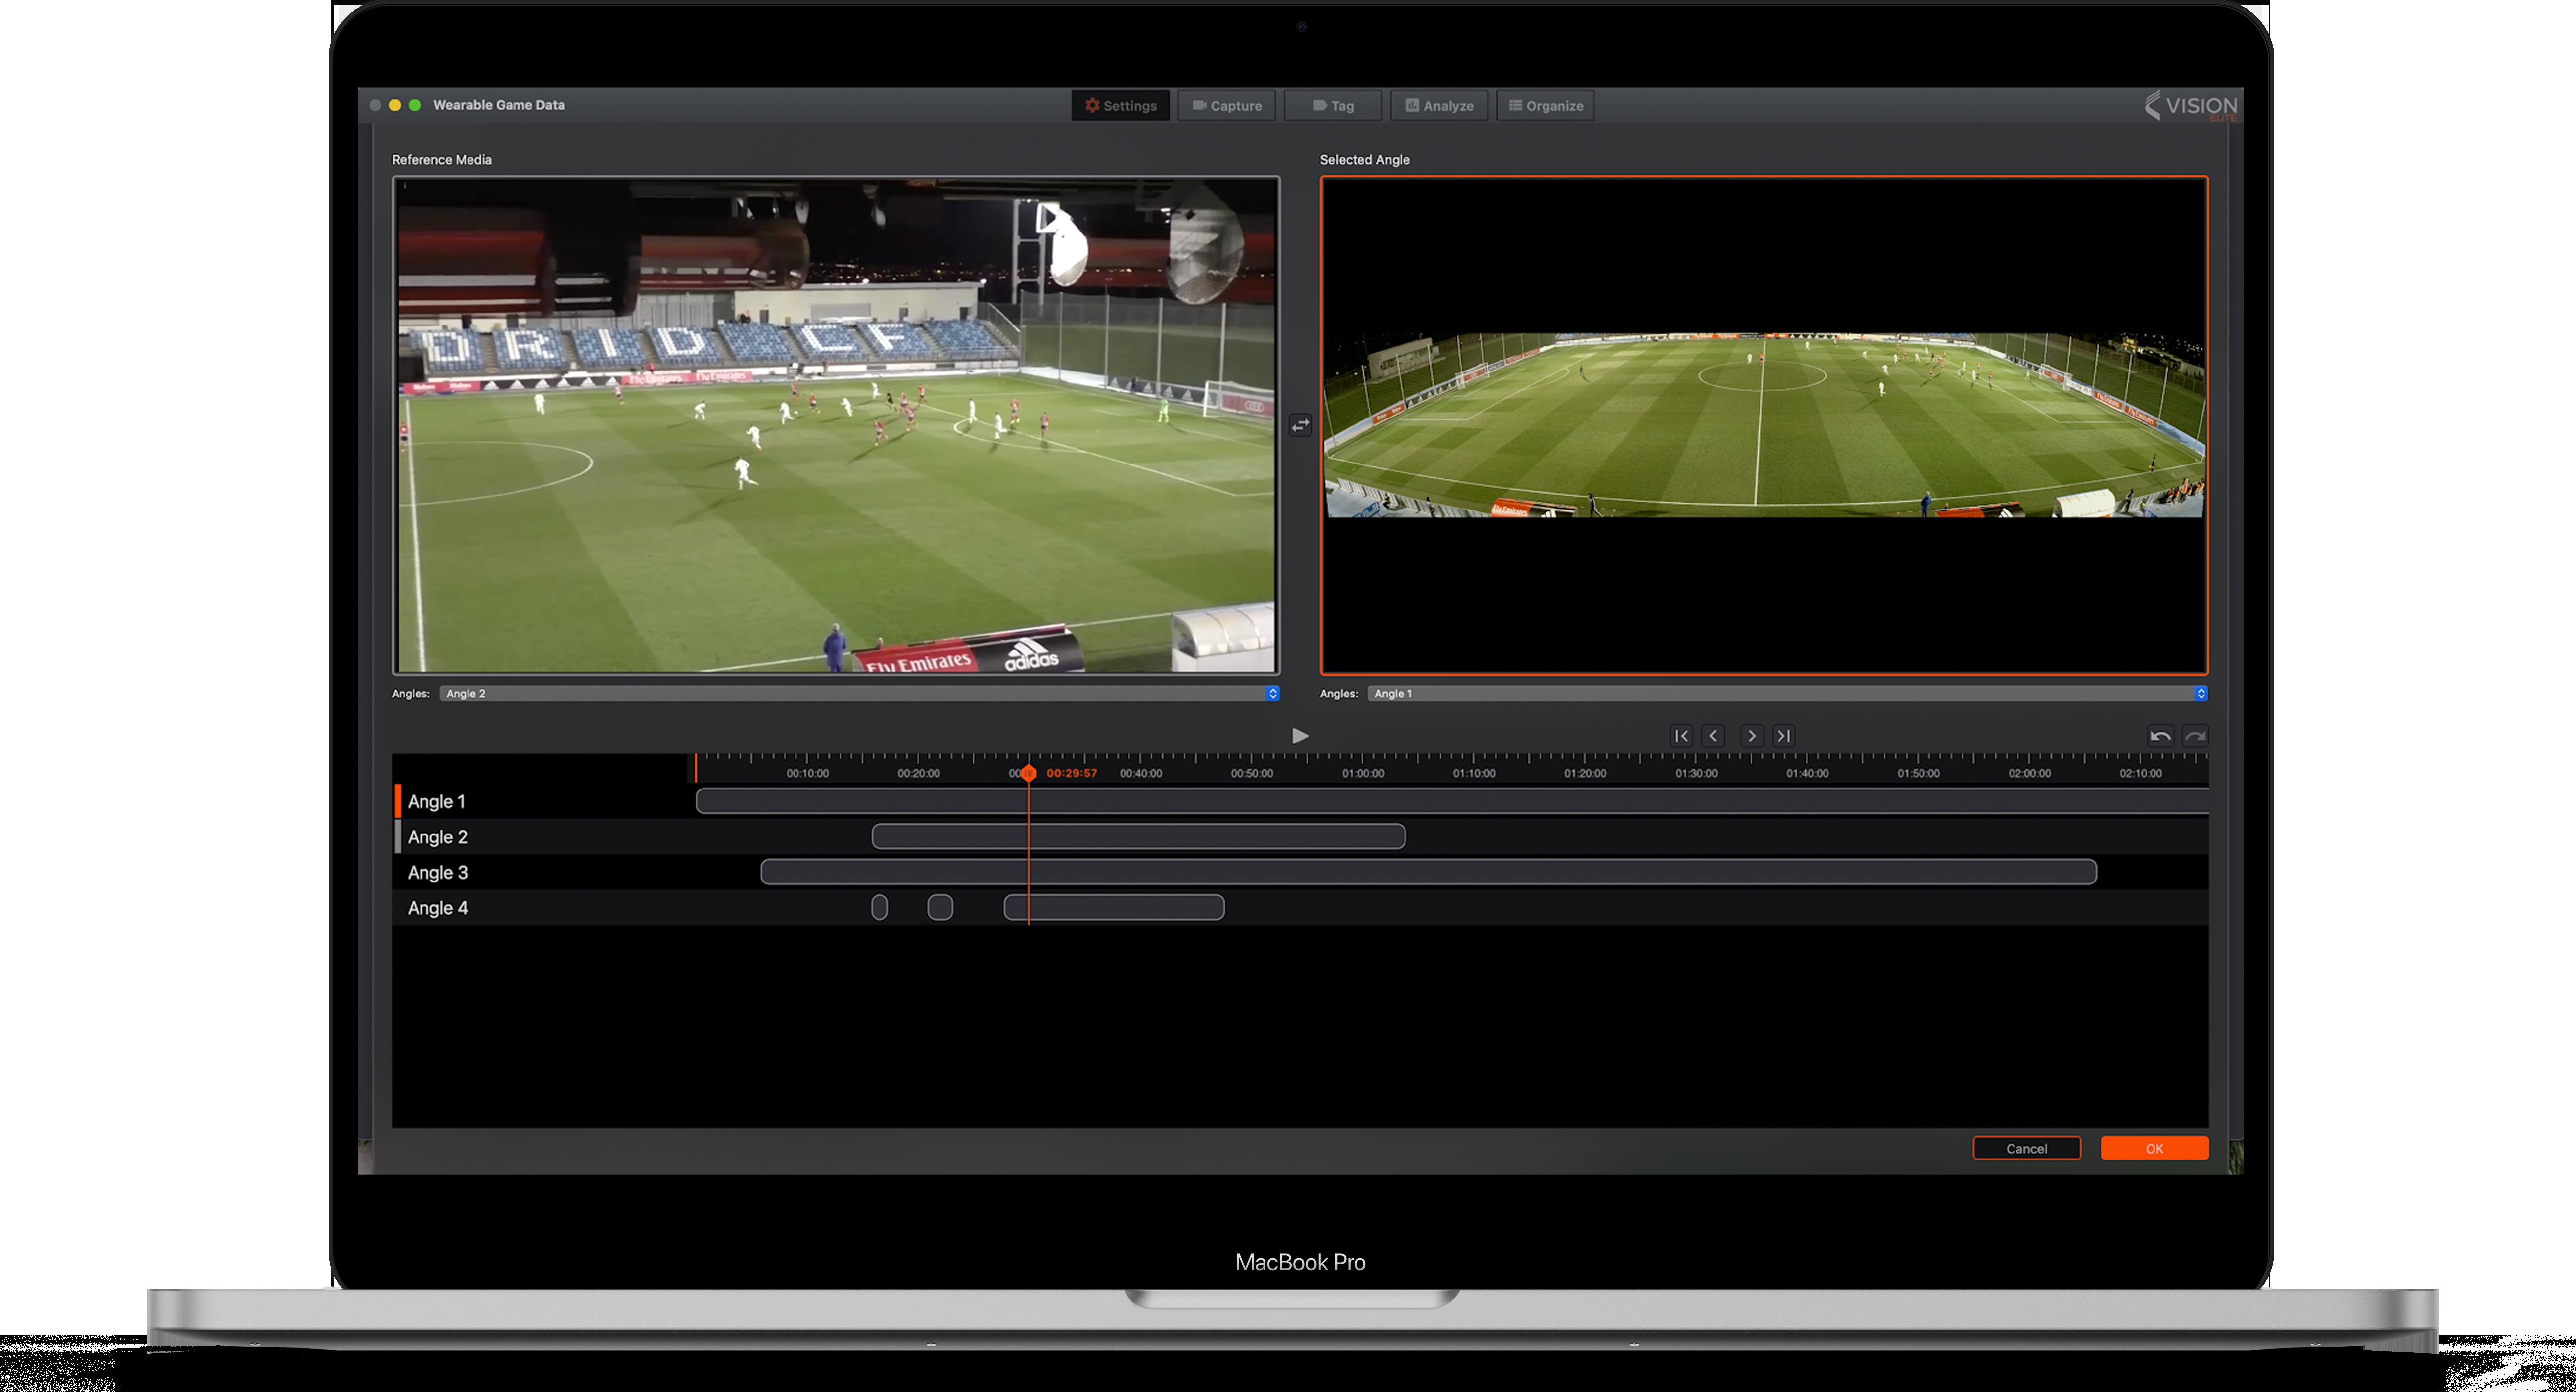 Vision: Capture en direct multi-angles - Football